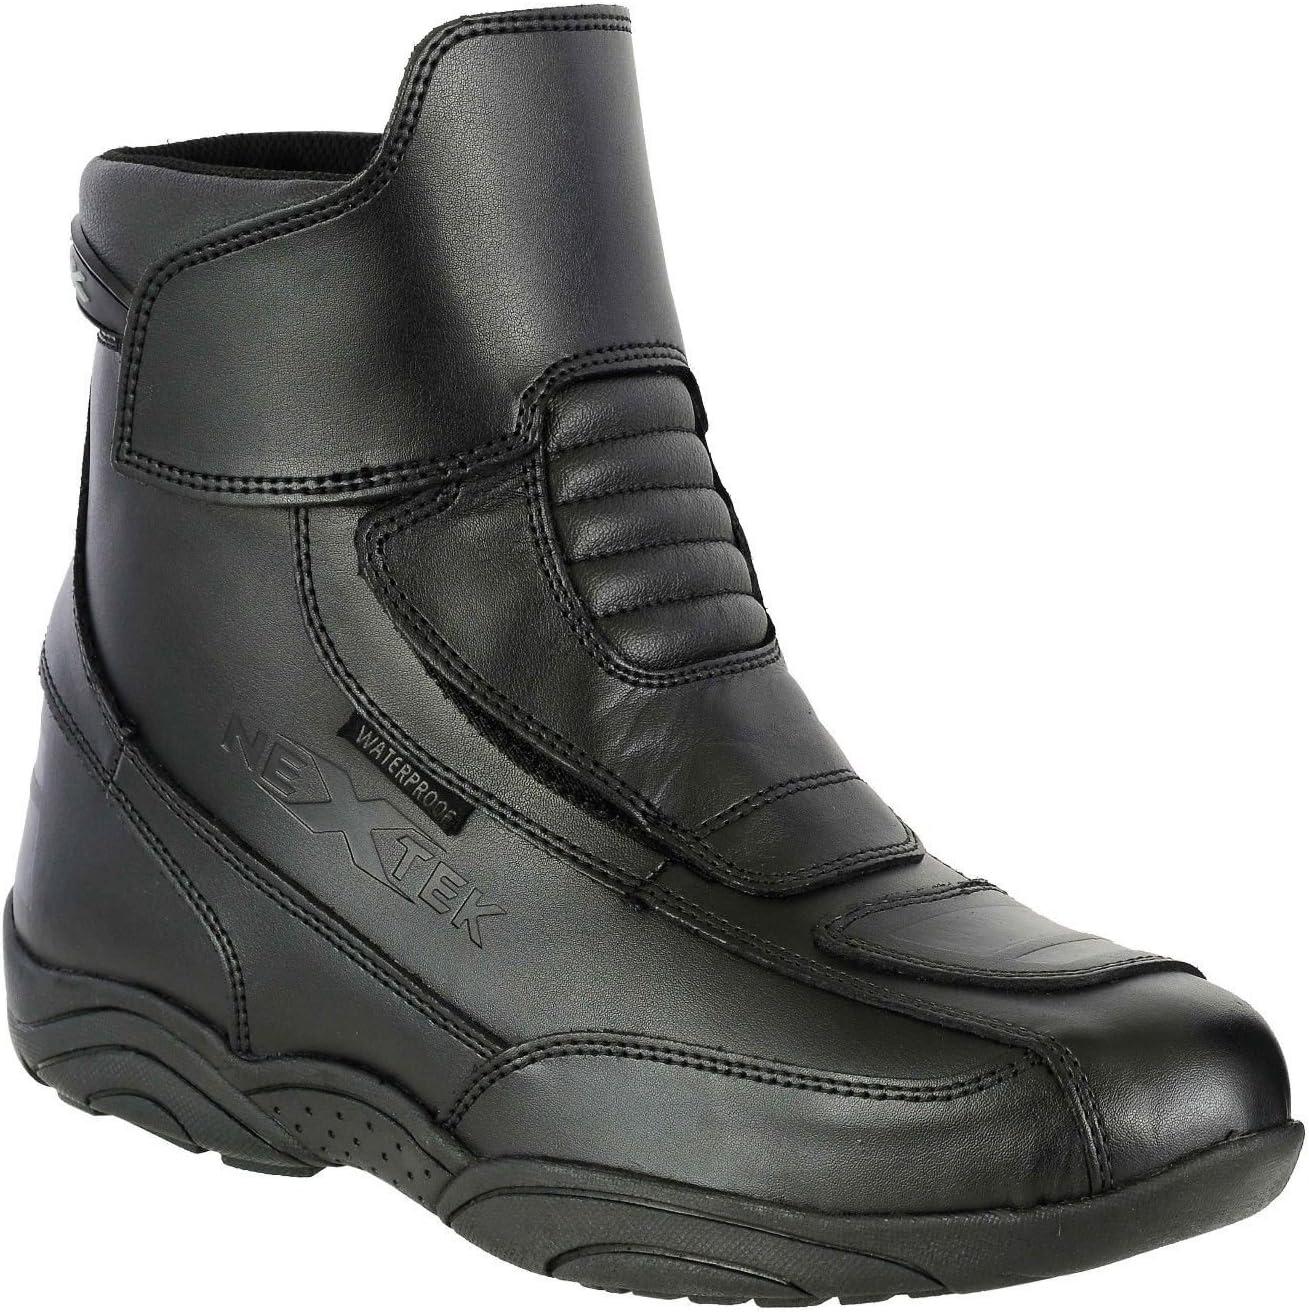 impermeables tobillo corto de Armour trainers Botas de piel genuina color negro para motocicleta si cremallera